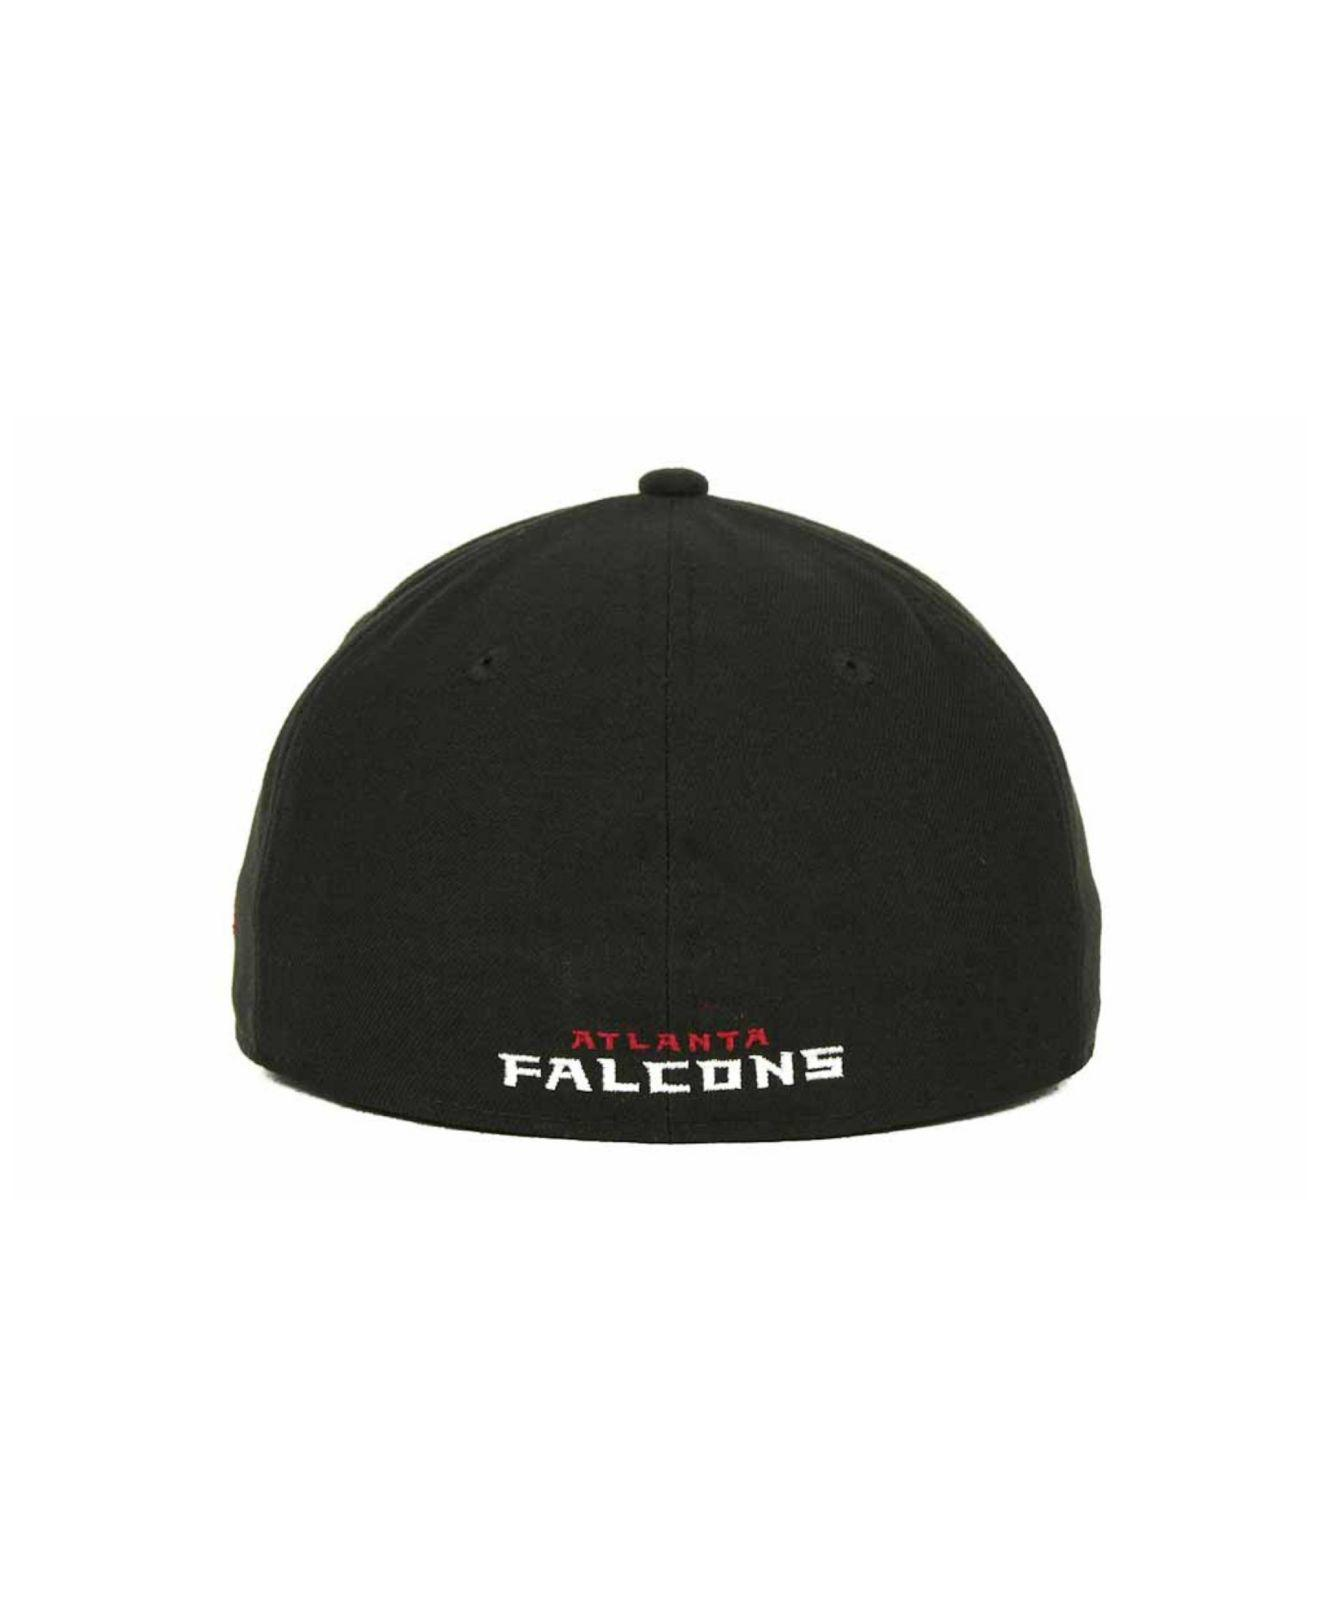 timeless design d61b1 91a88 ... spain usa lyst ktz atlanta falcons nfl black team 59fifty cap in black  for men 7d91c